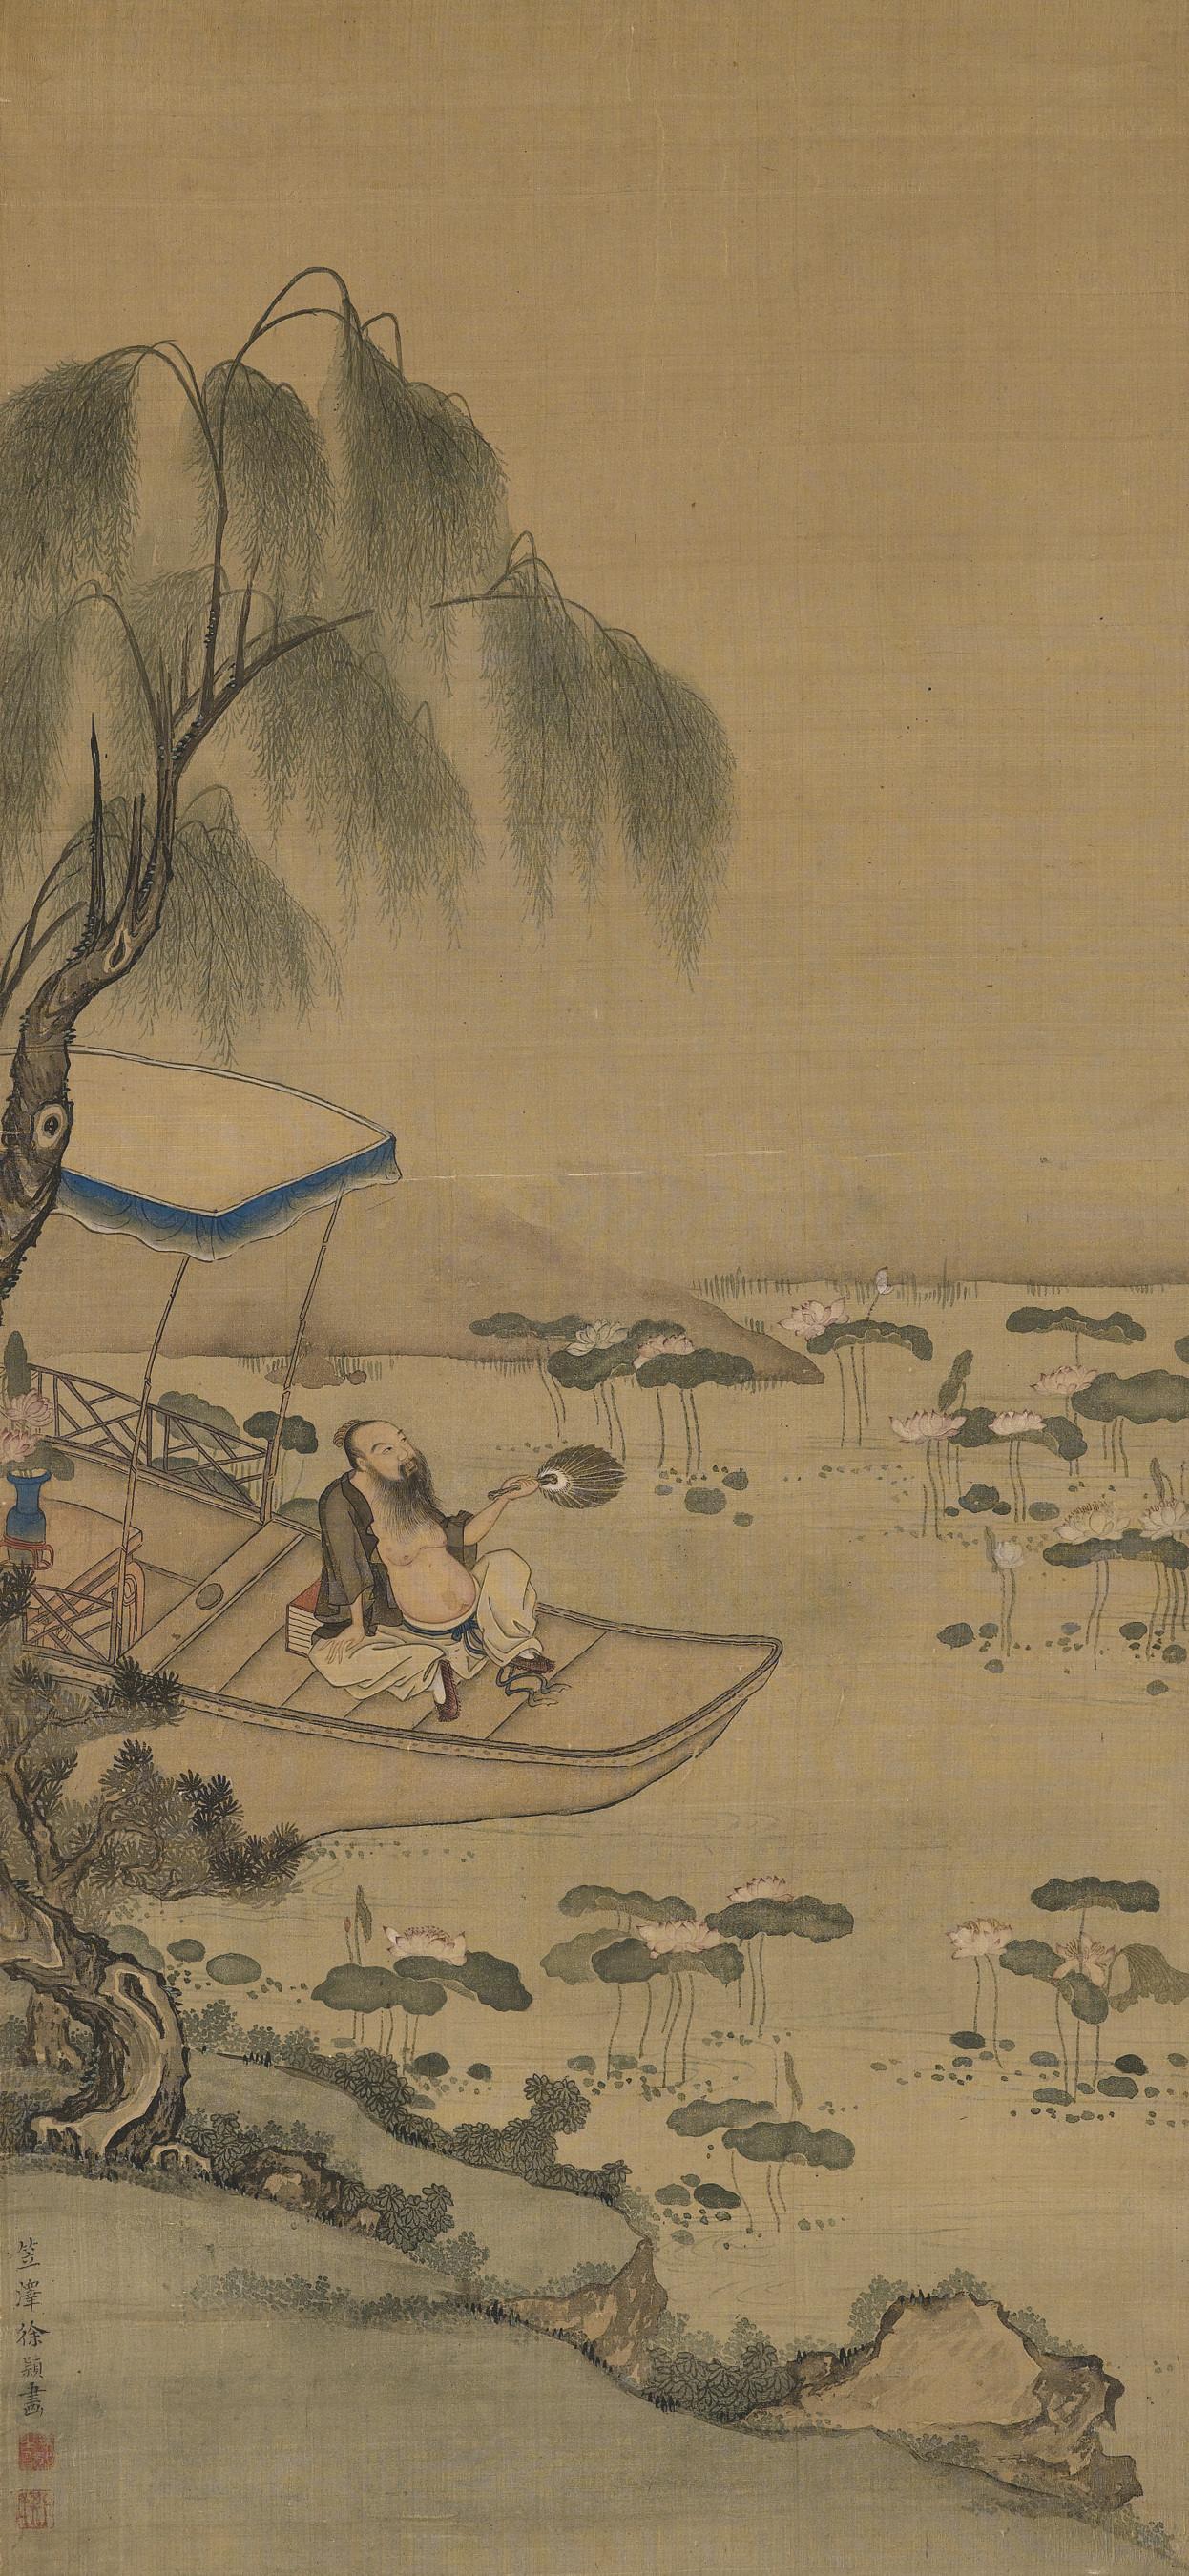 XU YING (17TH-18TH CENTURY)